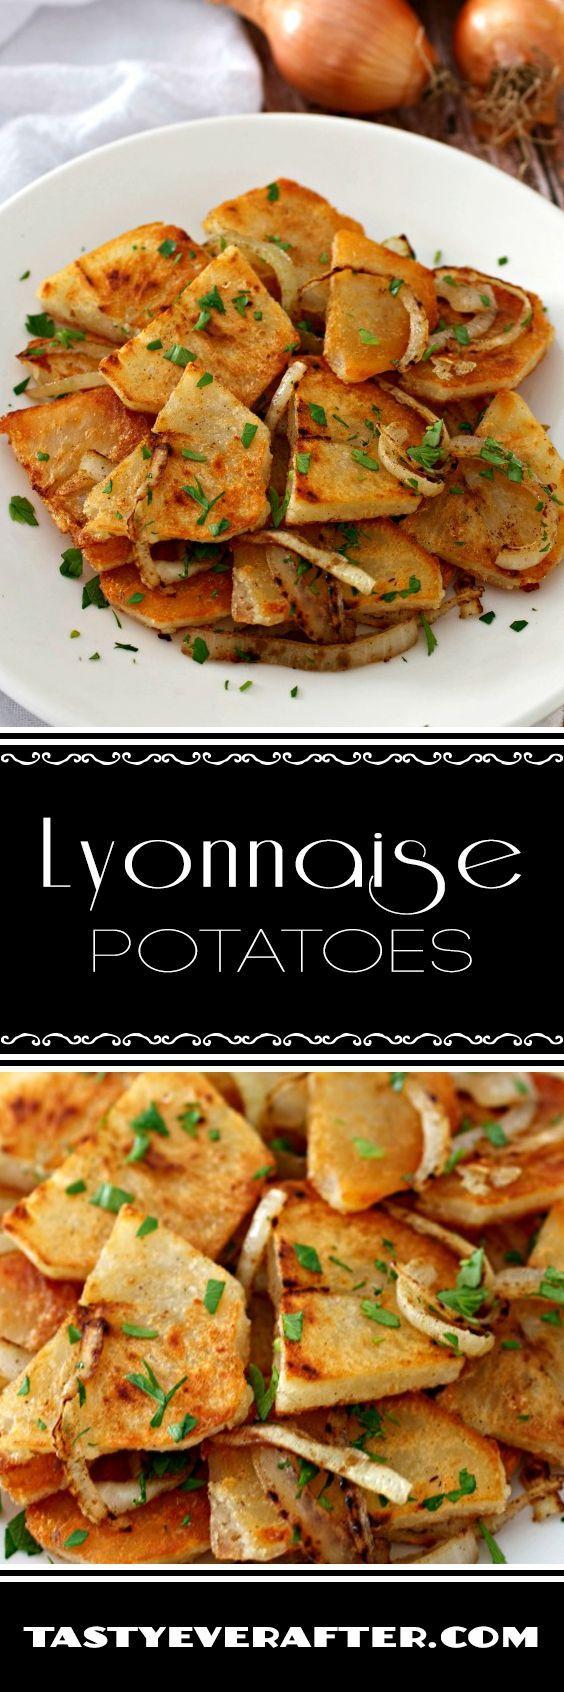 Easy french potato recipes